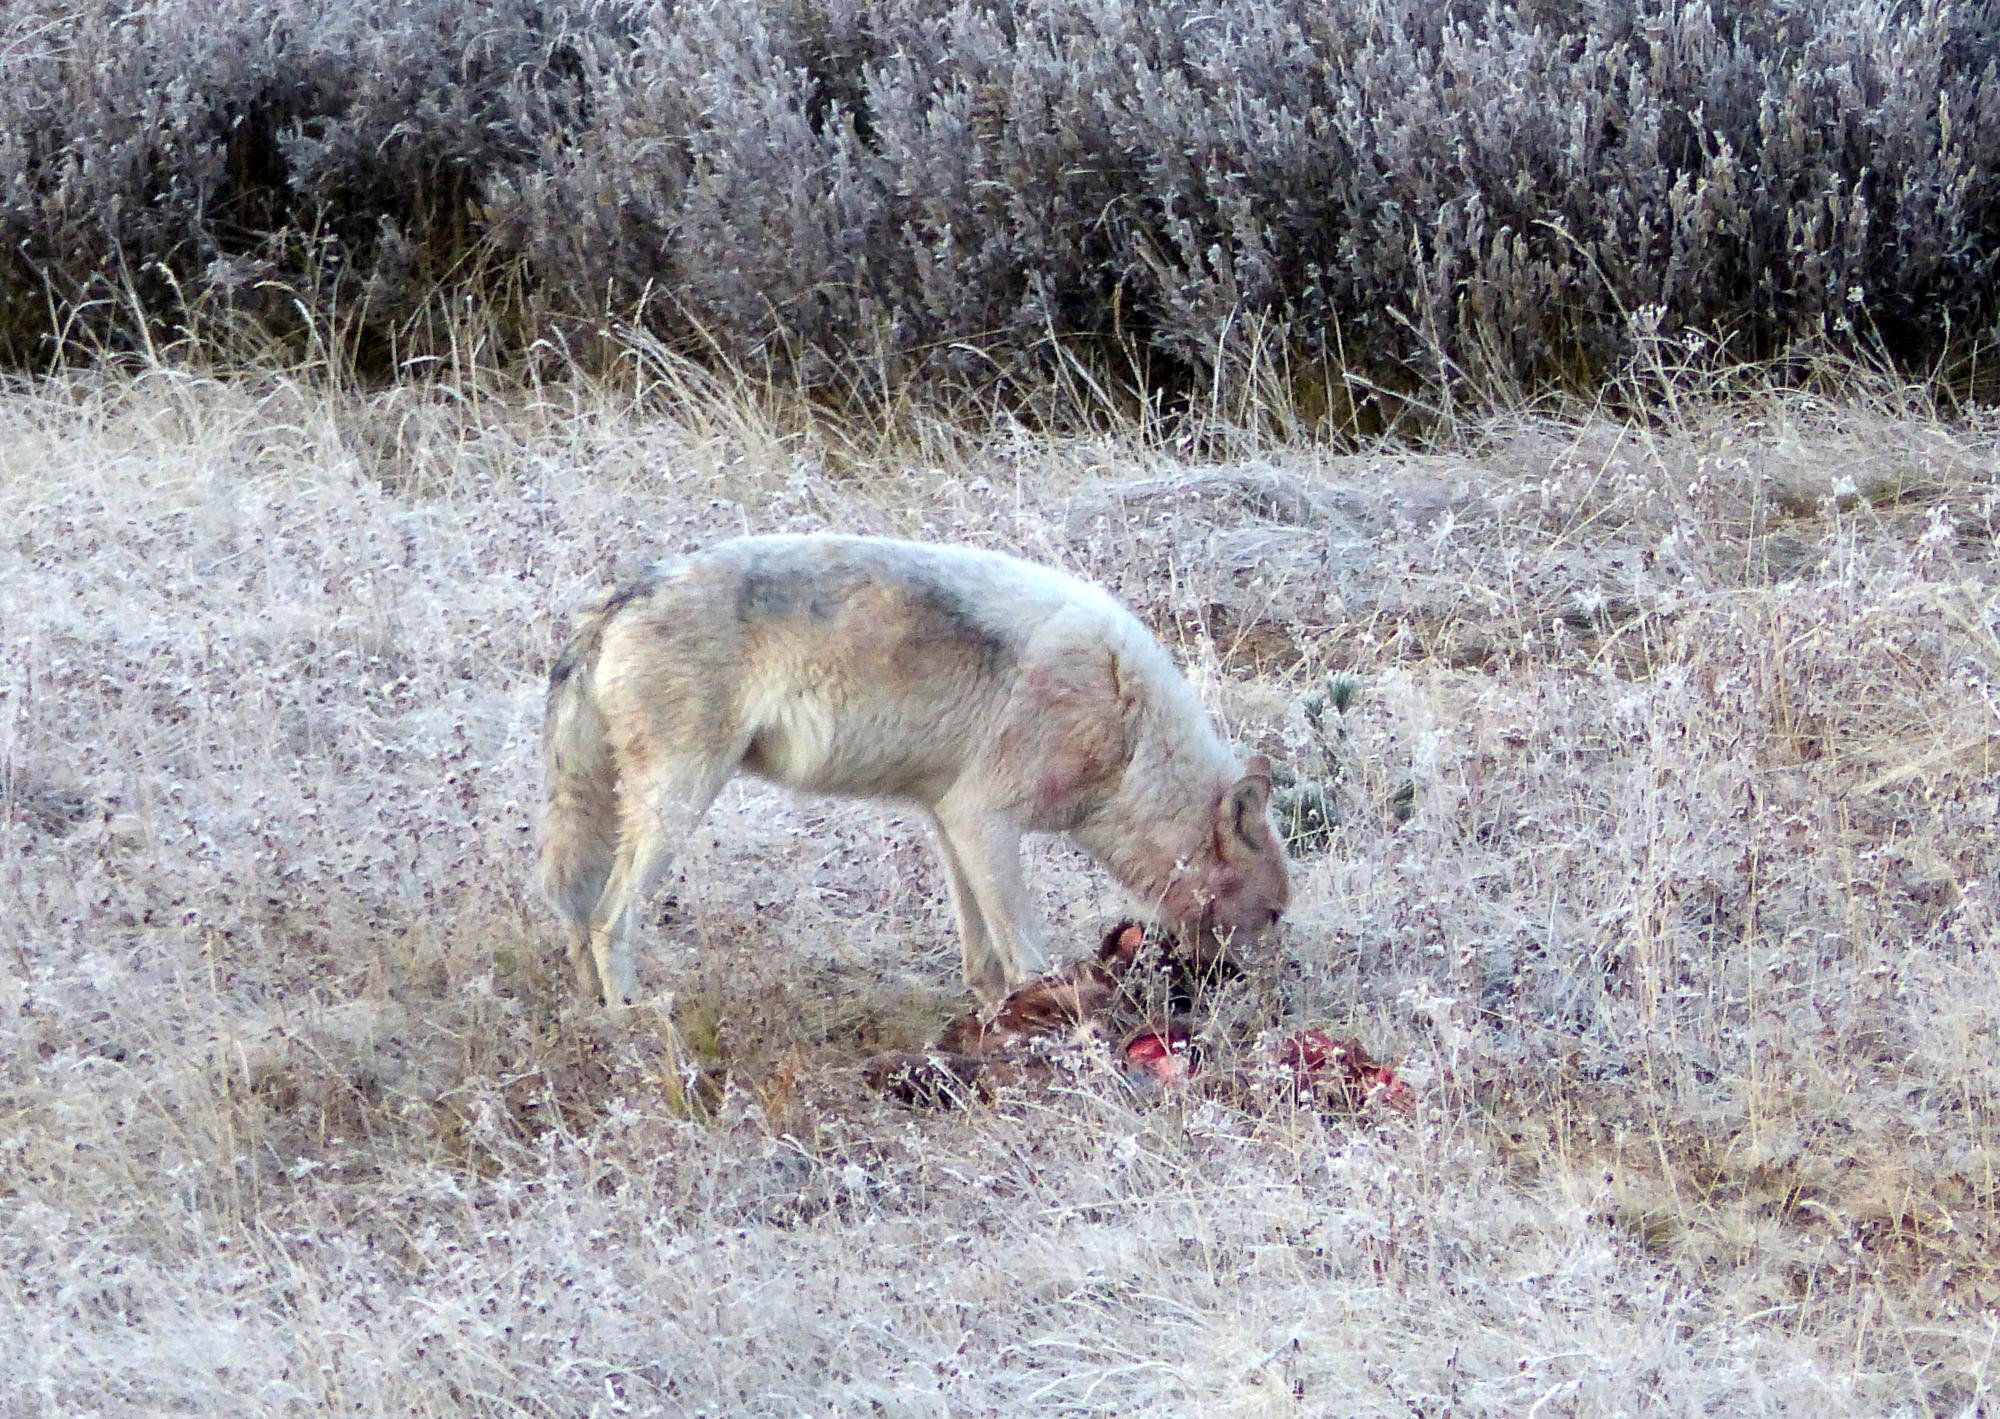 Wolf eating her fresh kill